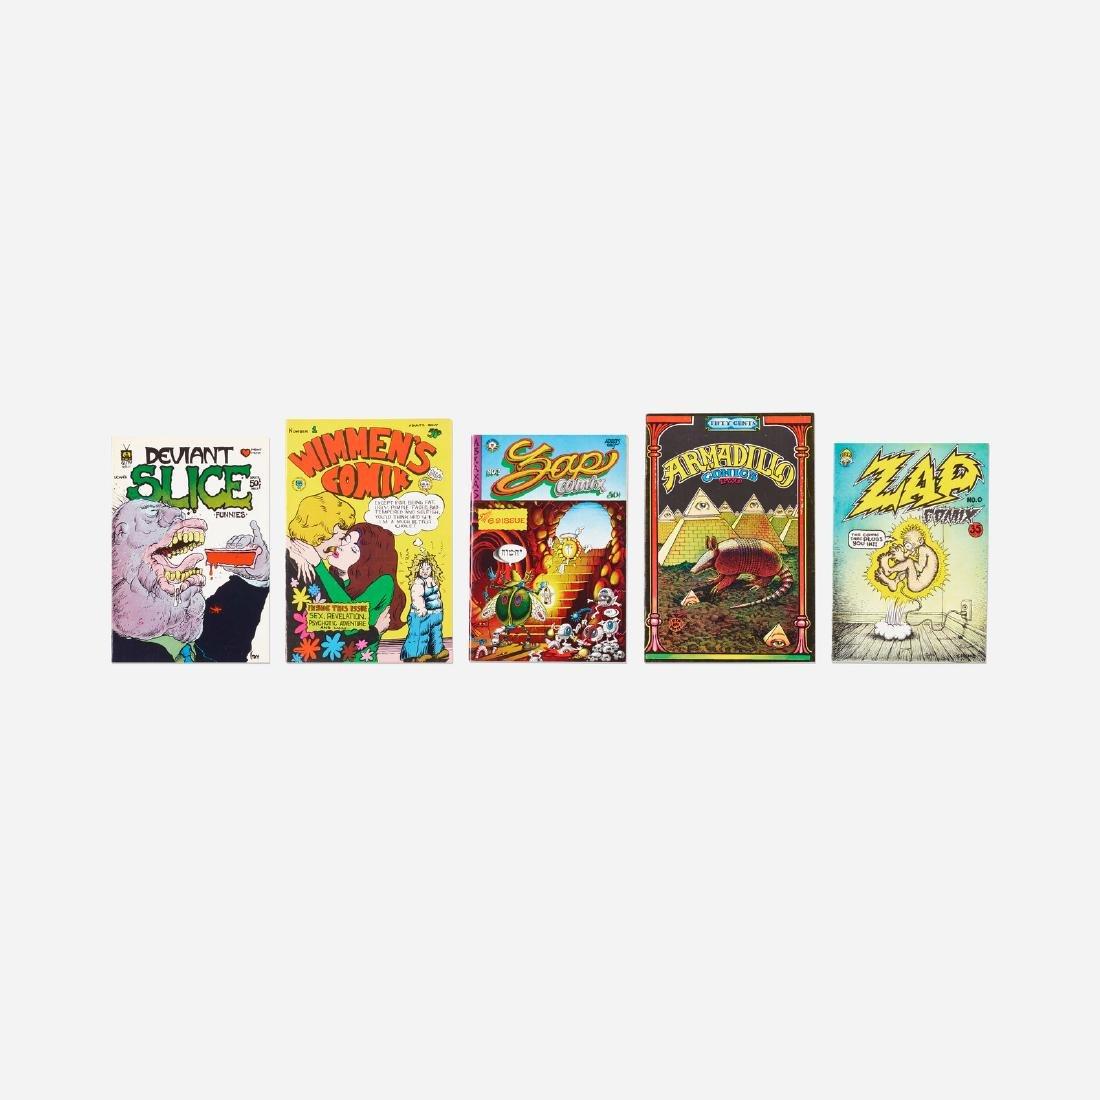 Robert Crumb, Rare comic books, collection of five